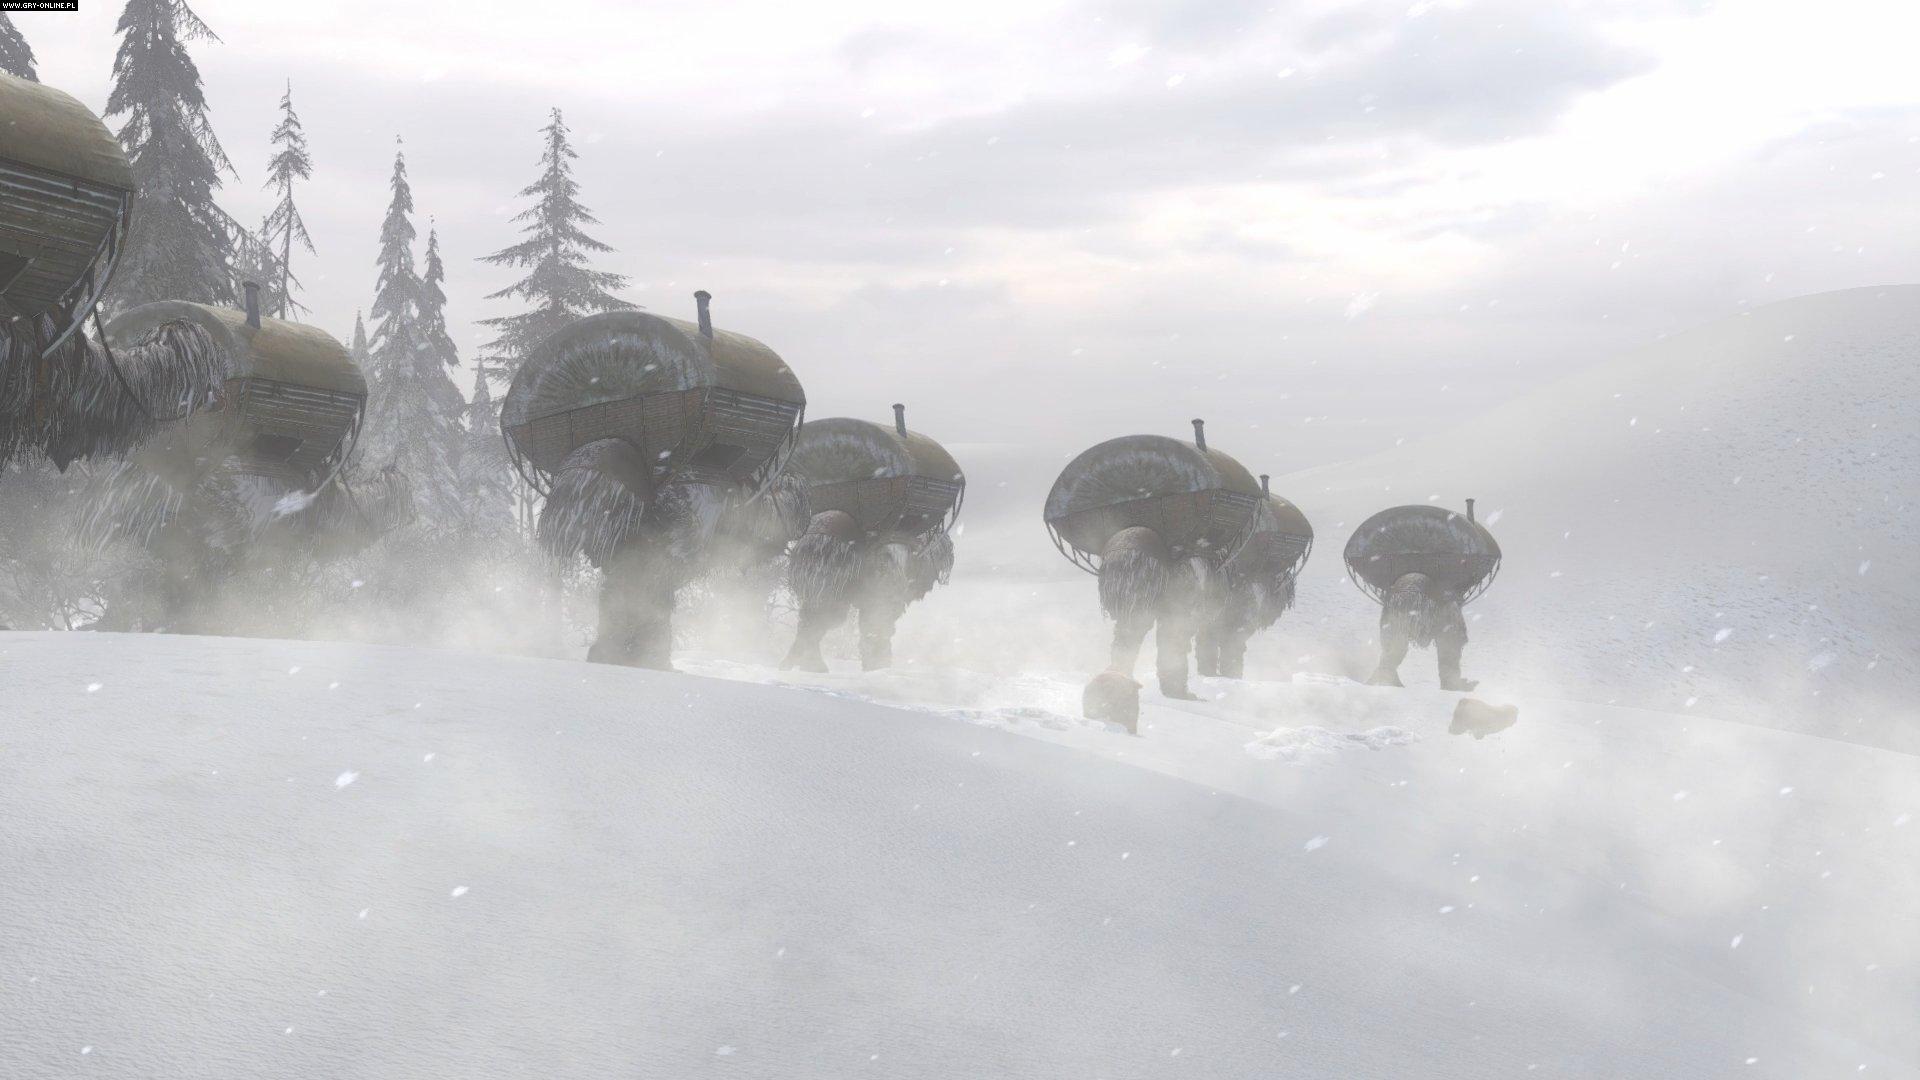 Syberia 3 PC, PS4, XONE Games Image 9/30, Microids/Anuman Interactive